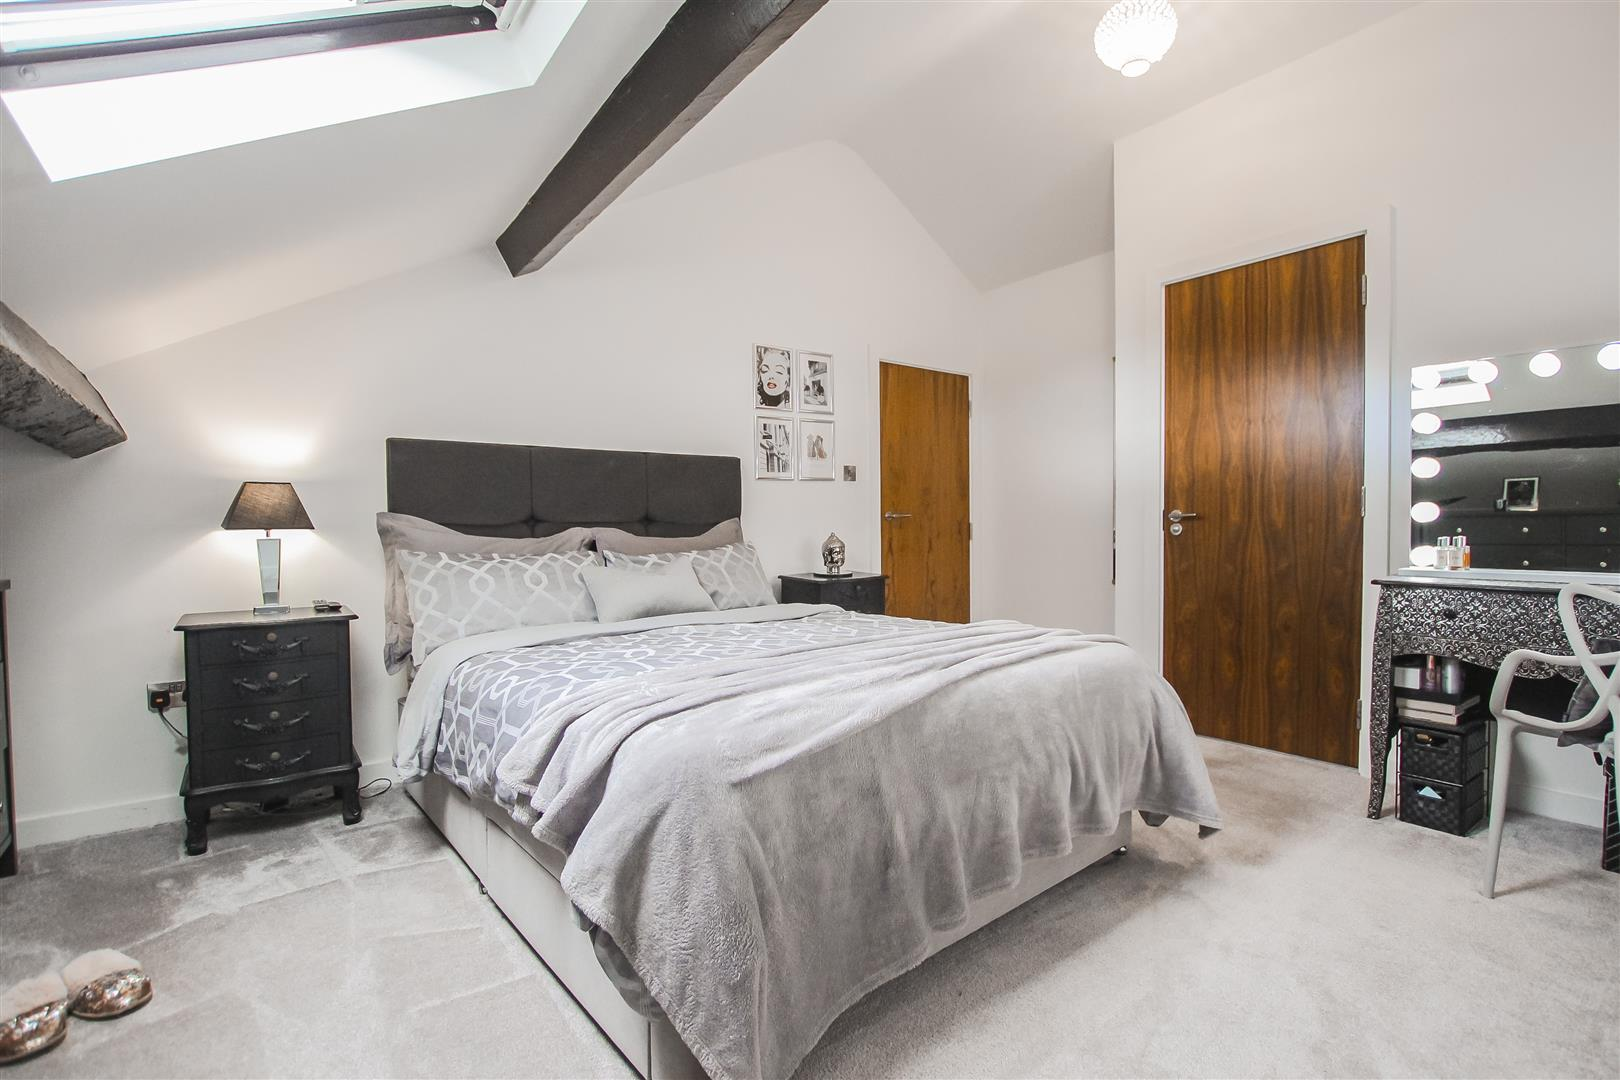 3 Bedroom Duplex Apartment For Sale - Image 9